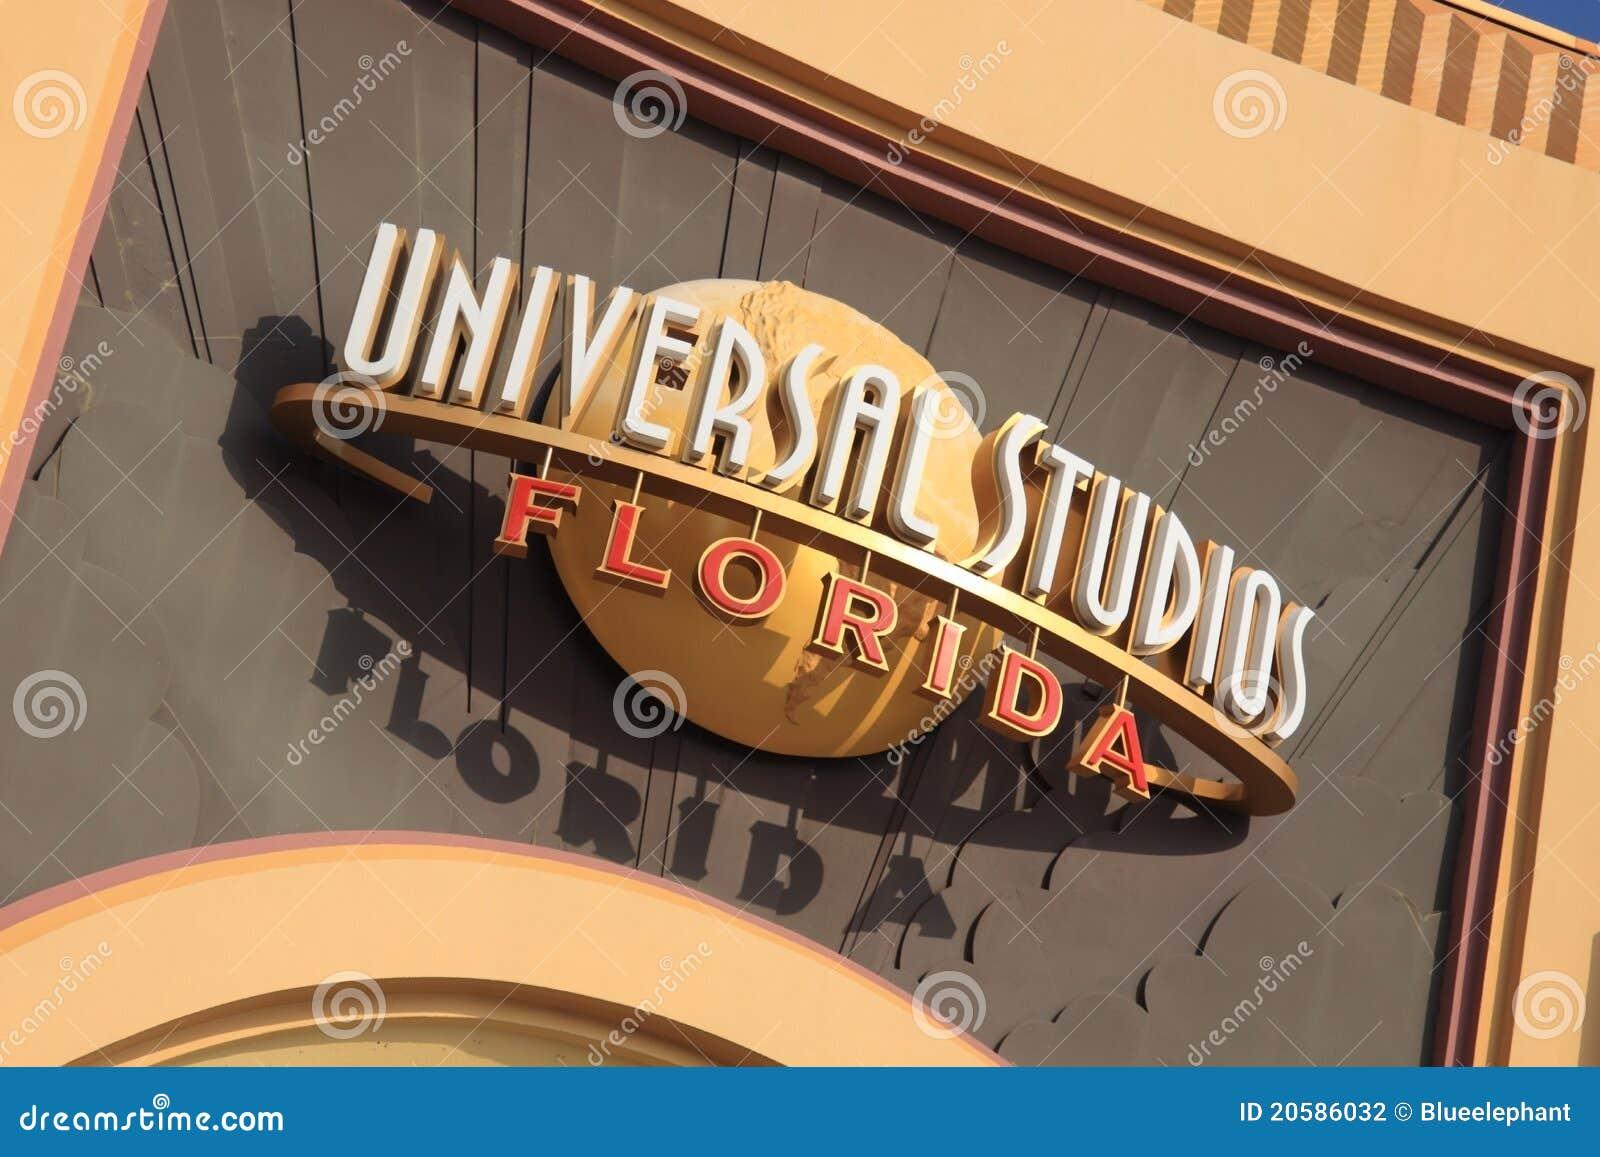 Universal Studio in Orlando, Florida